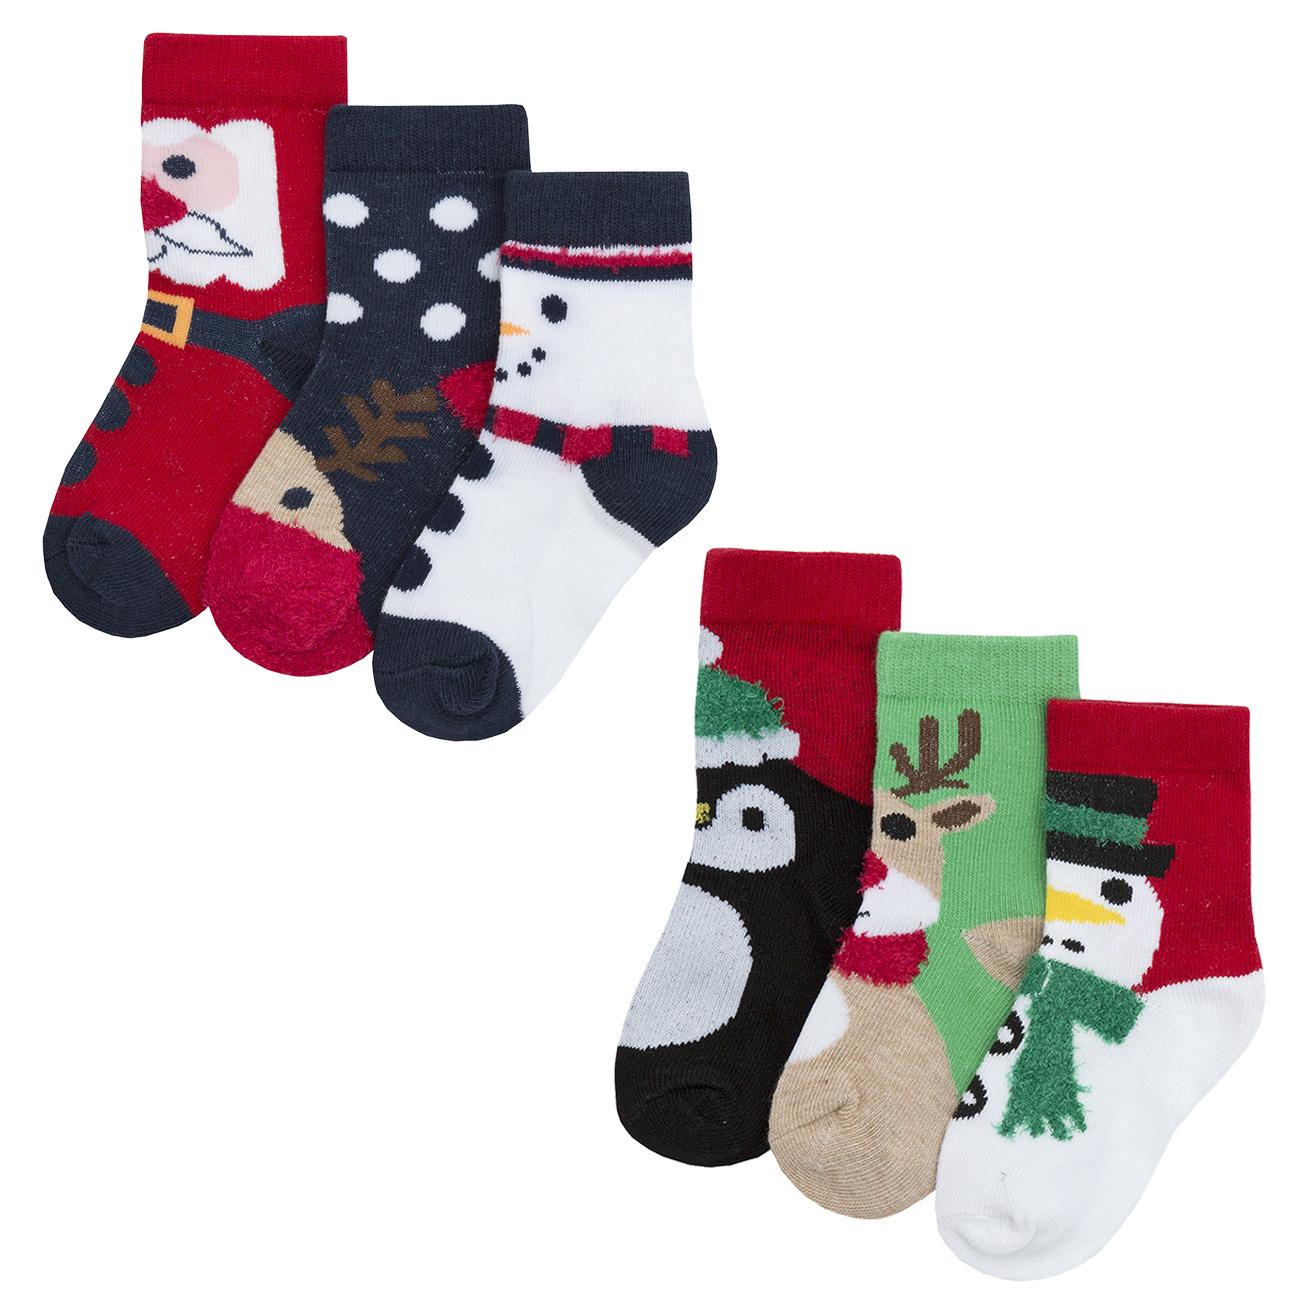 Boys Christmas Socks.Details About Babies Baby Boys Girls Novelty Christmas Socks Stocking Filler Cotton Rich Xmas